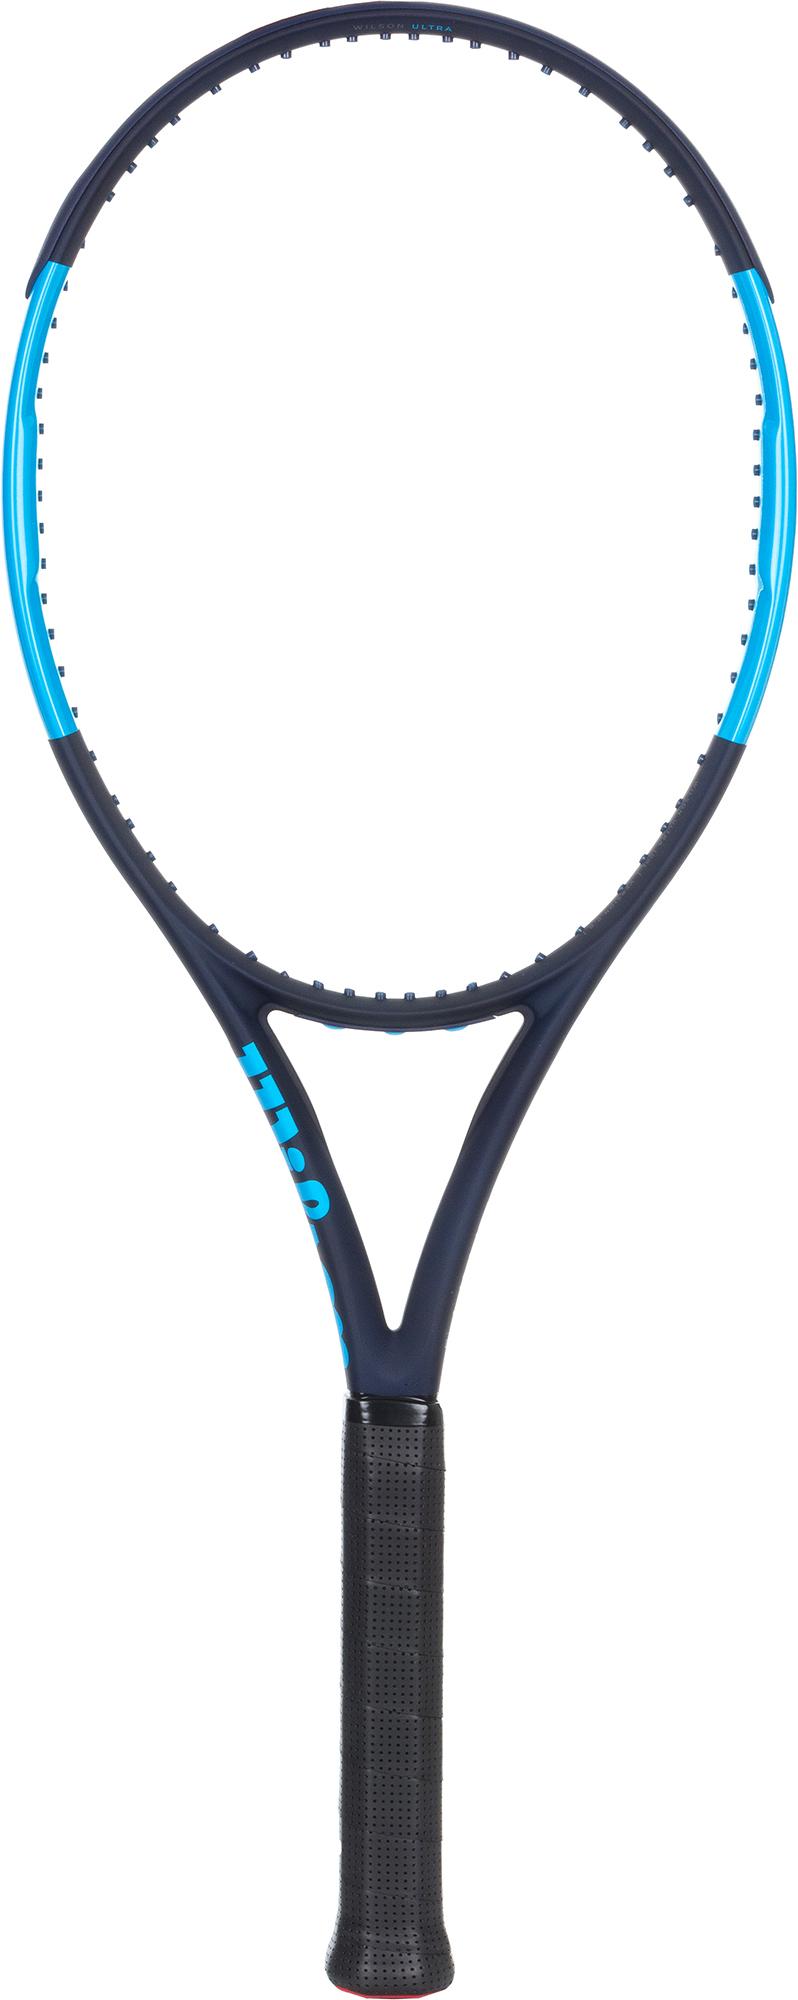 Wilson Ракетка для большого тенниса Wilson Ultra 100L, размер 3 wilson набор мячей для большого тенниса wilson australian open 3 ball can размер без размера